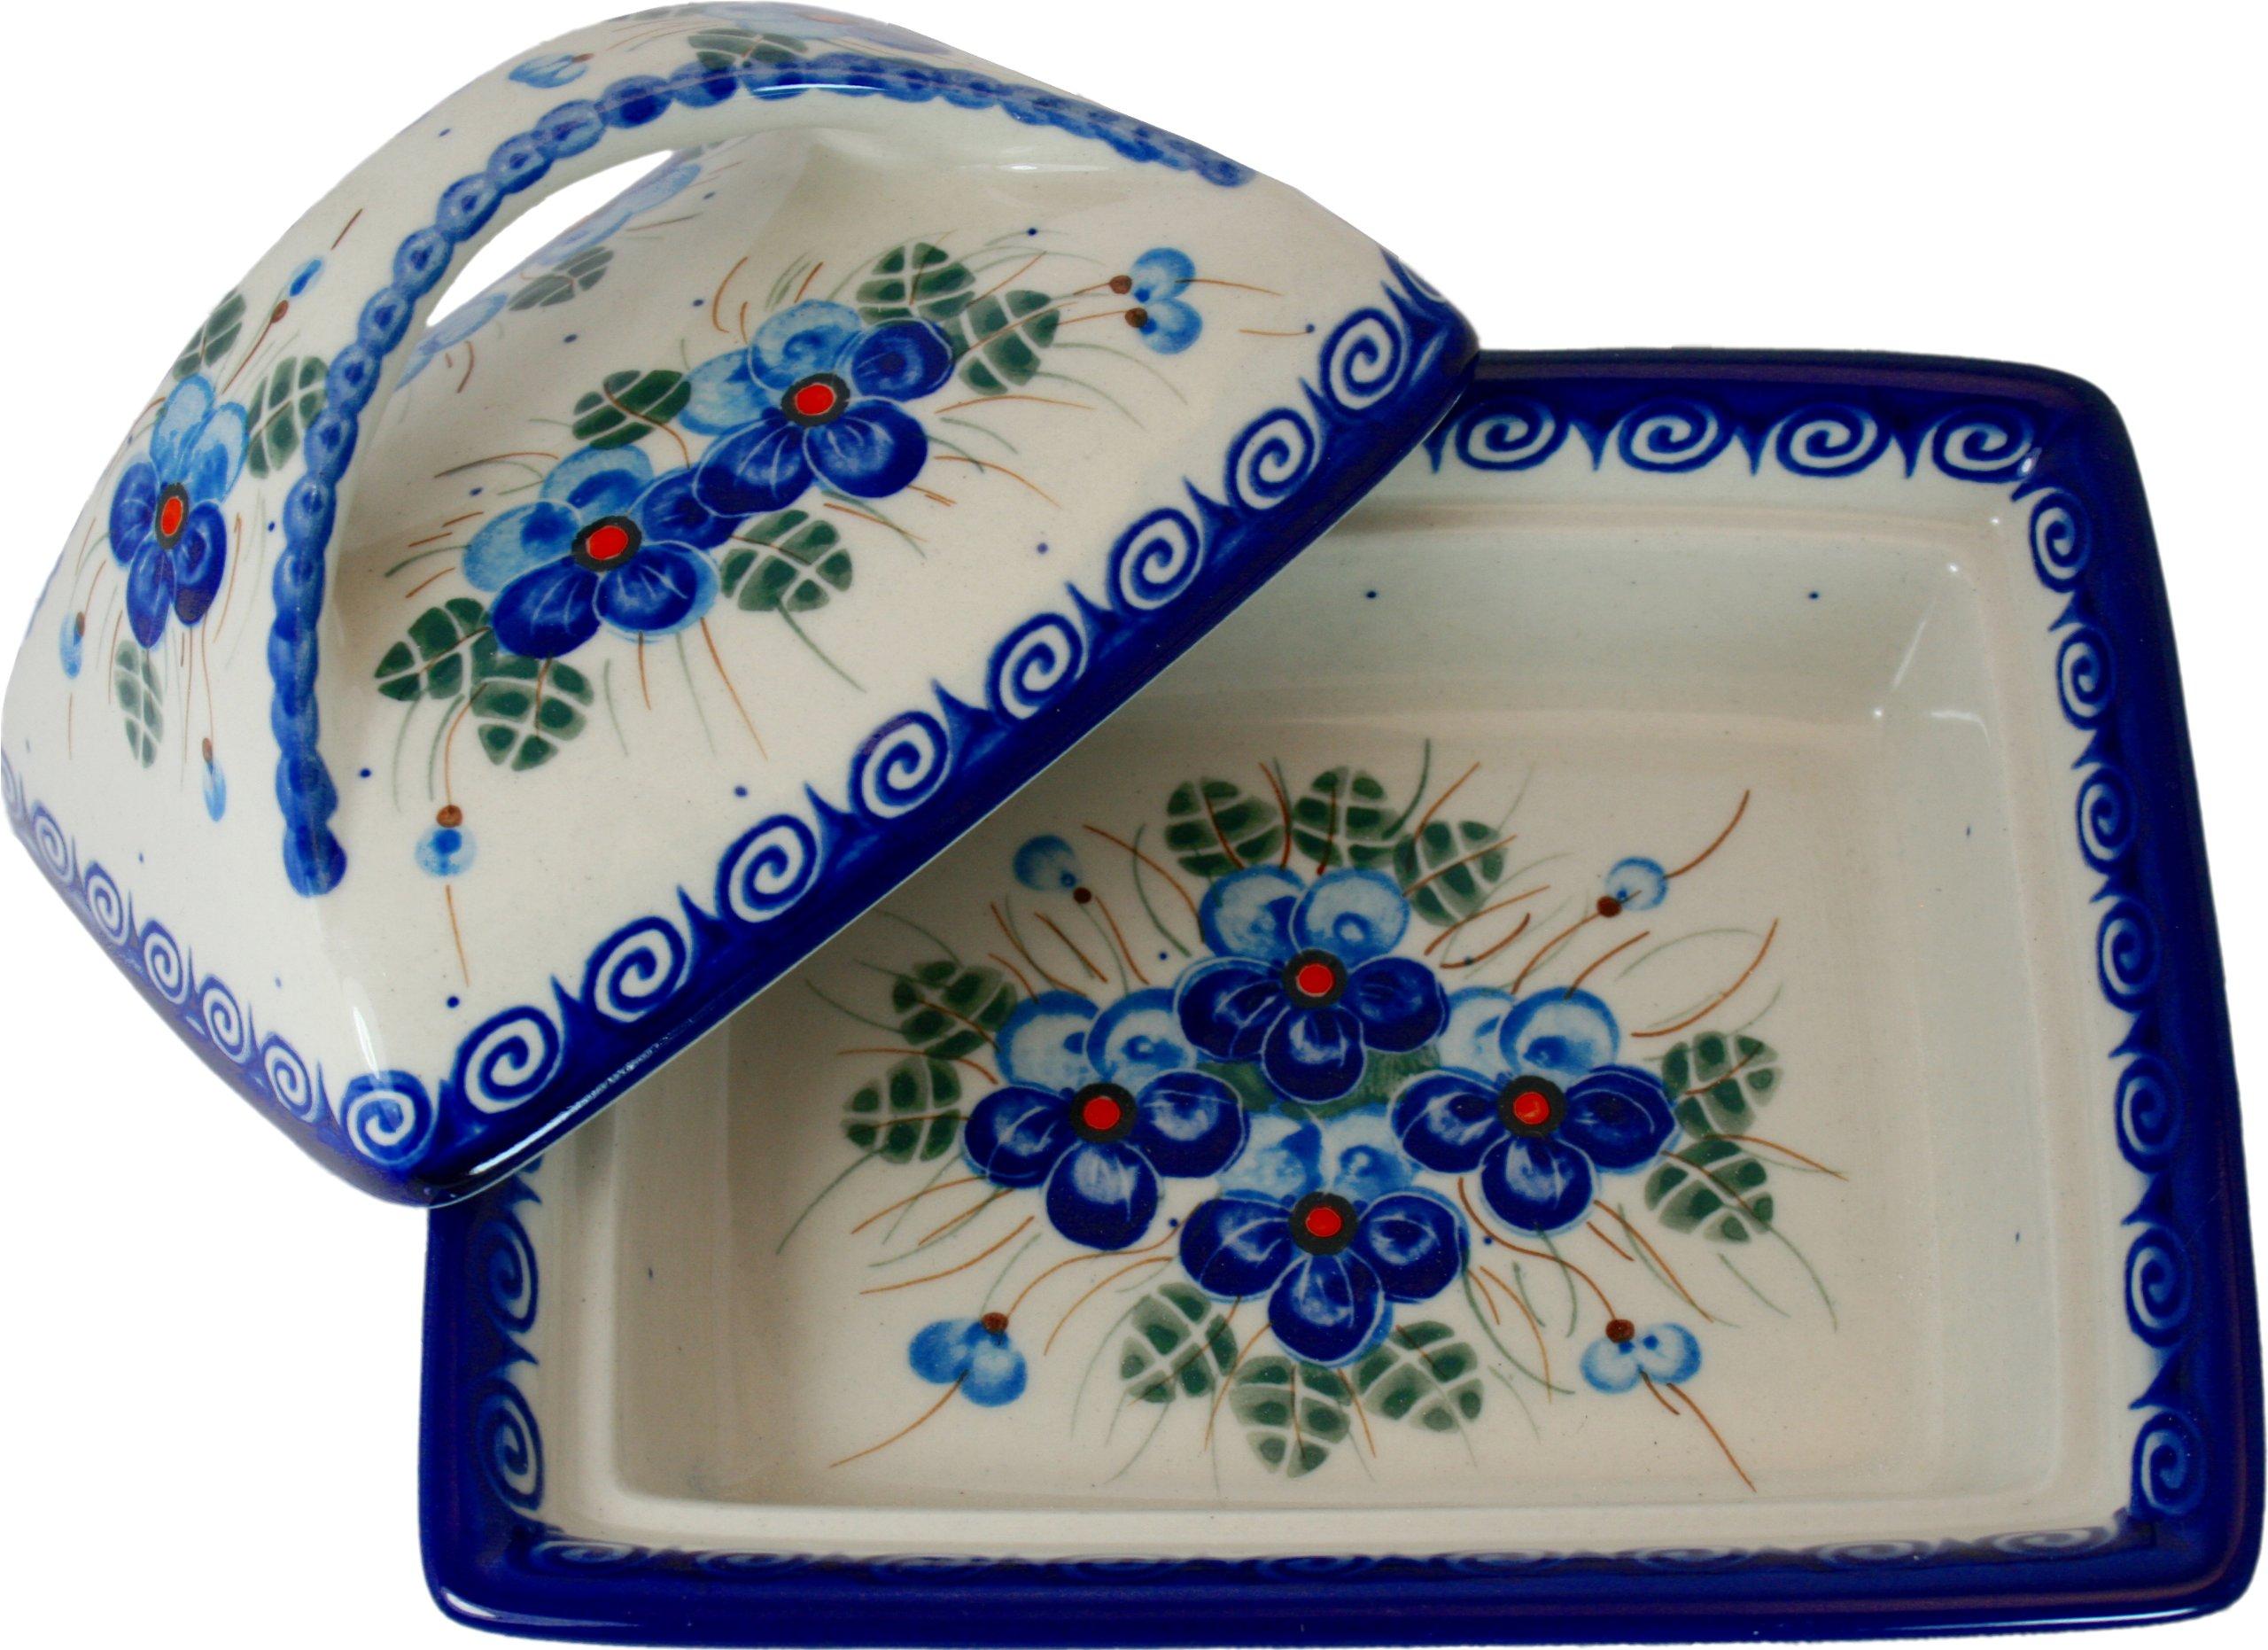 Polish Pottery Ceramika Boleslawiec, 0352/162, Butter Dish Deep, 2 Cubes, Royal Blue Patterns with Blue Pansy Flower Motif by Polish Pottery Ceramika Boleslawiec (Image #4)